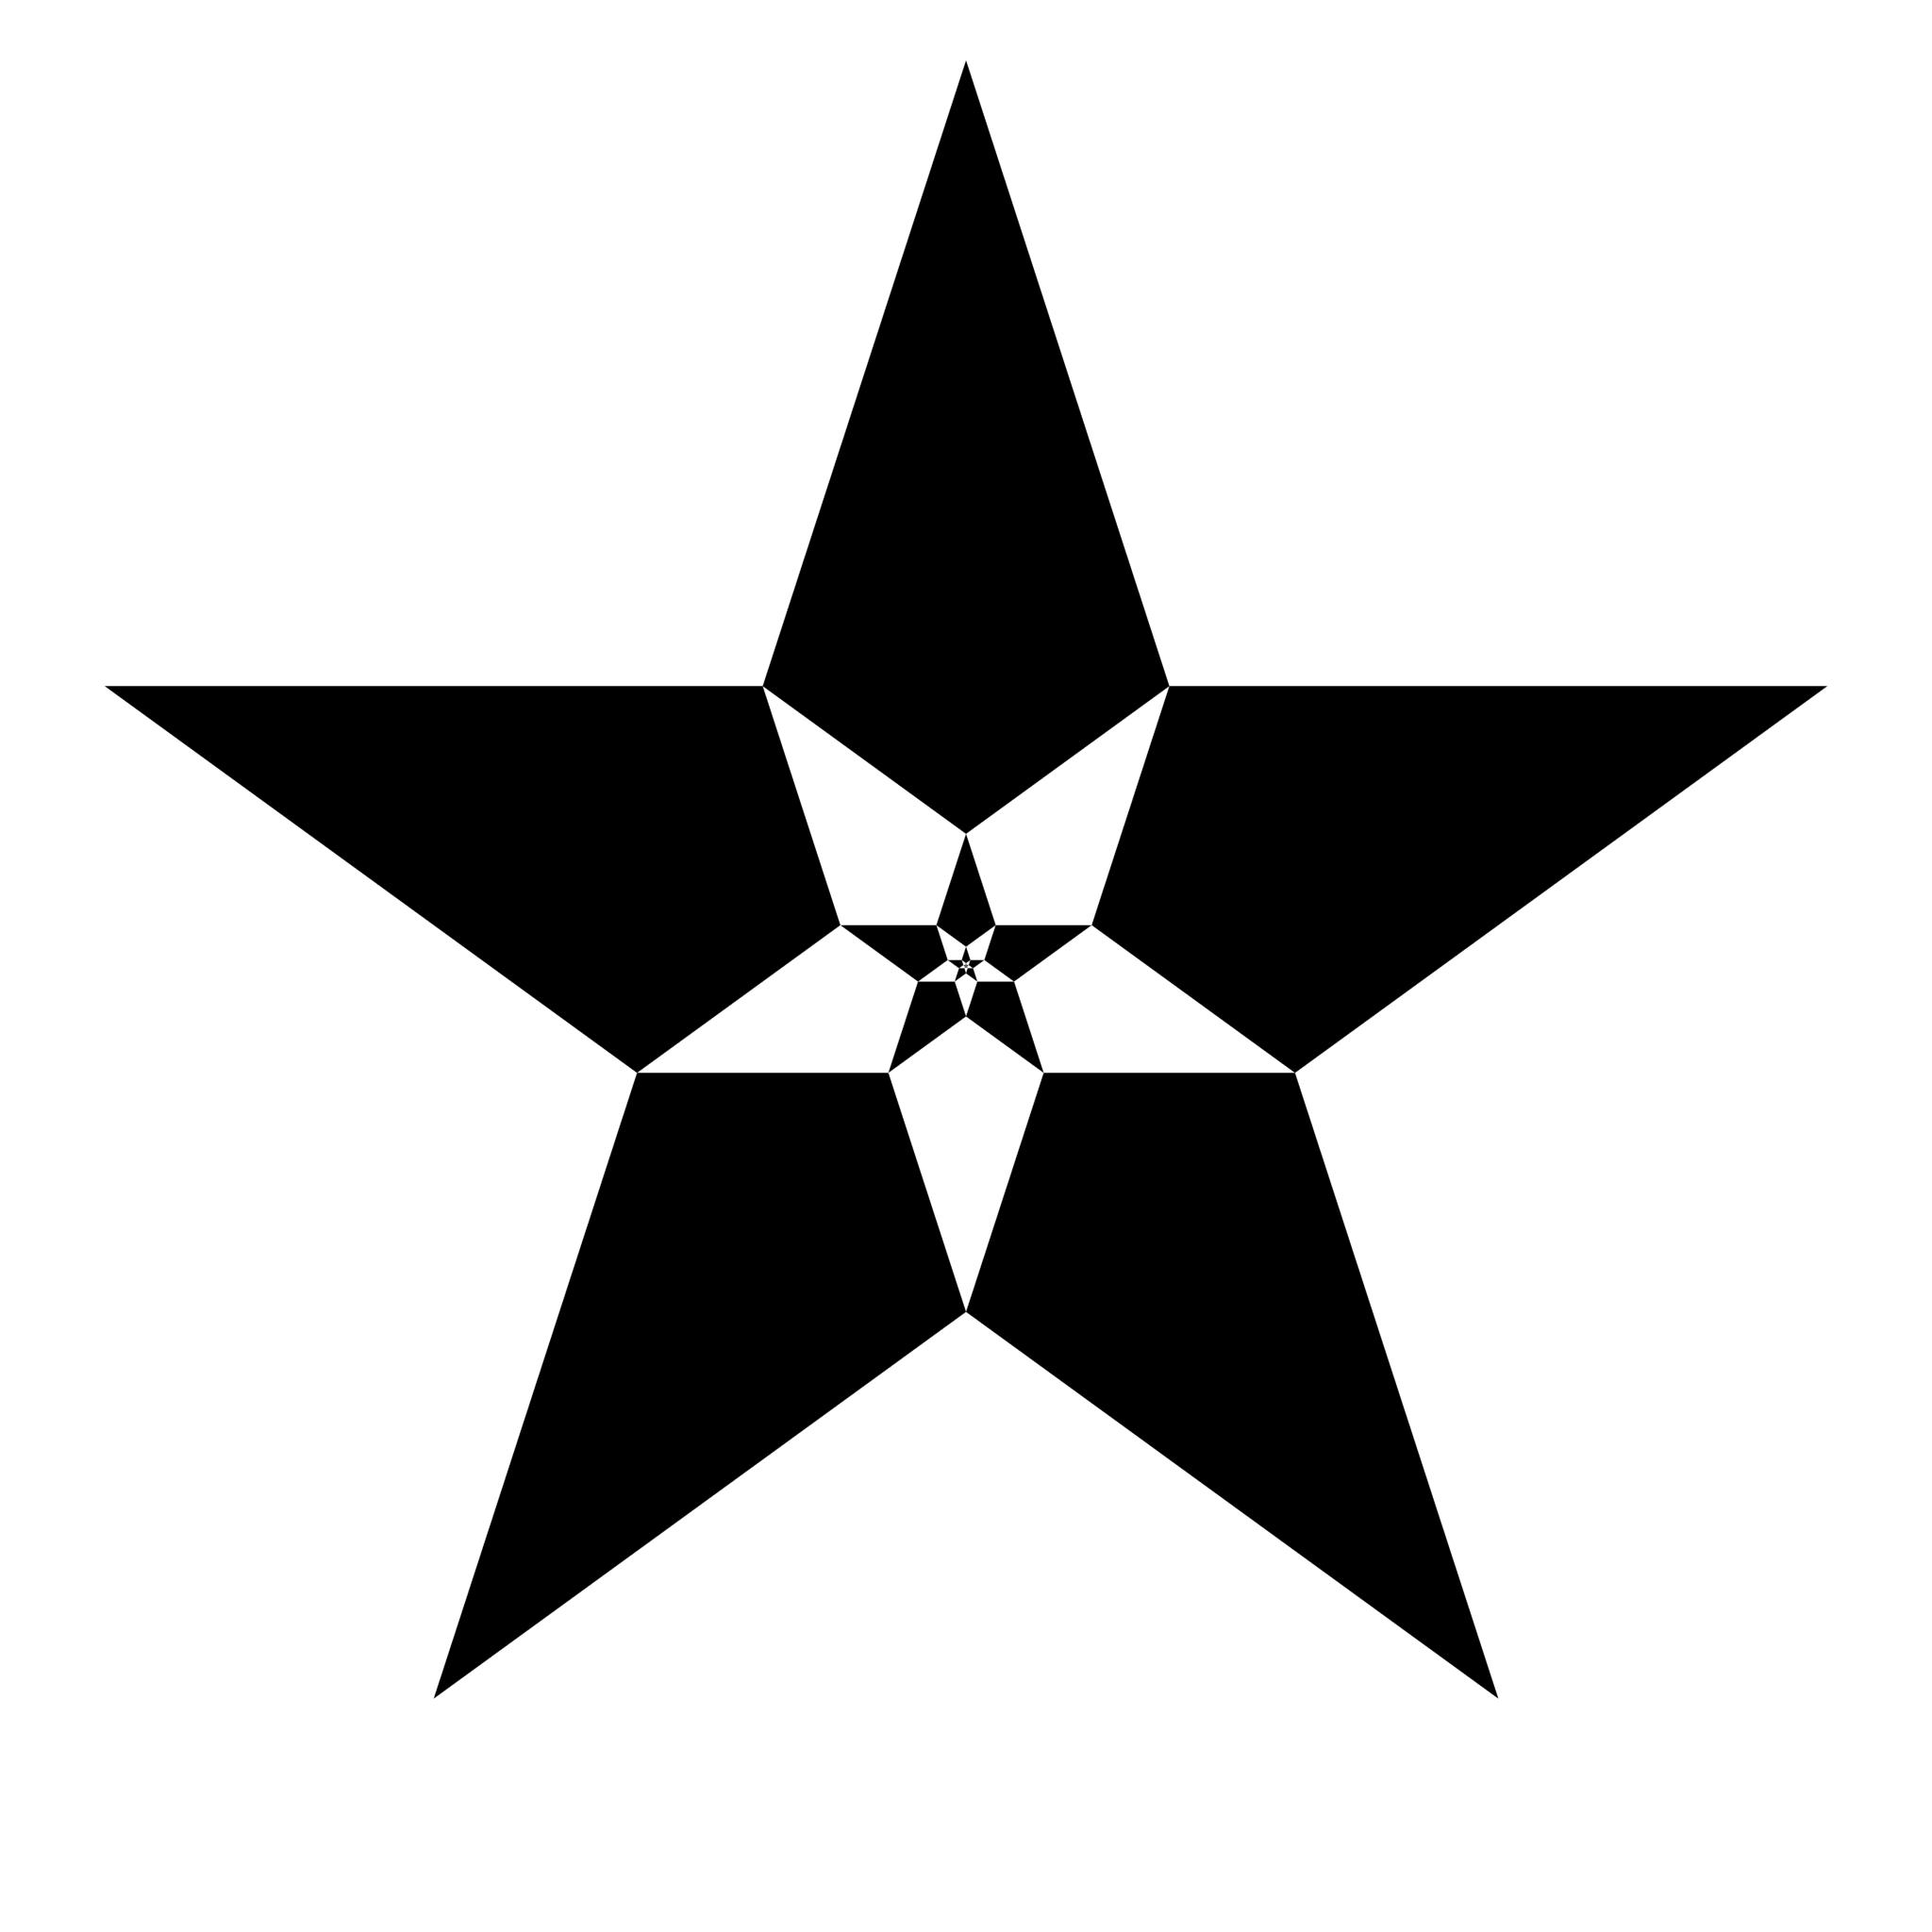 Recursive star polygons :: mathr